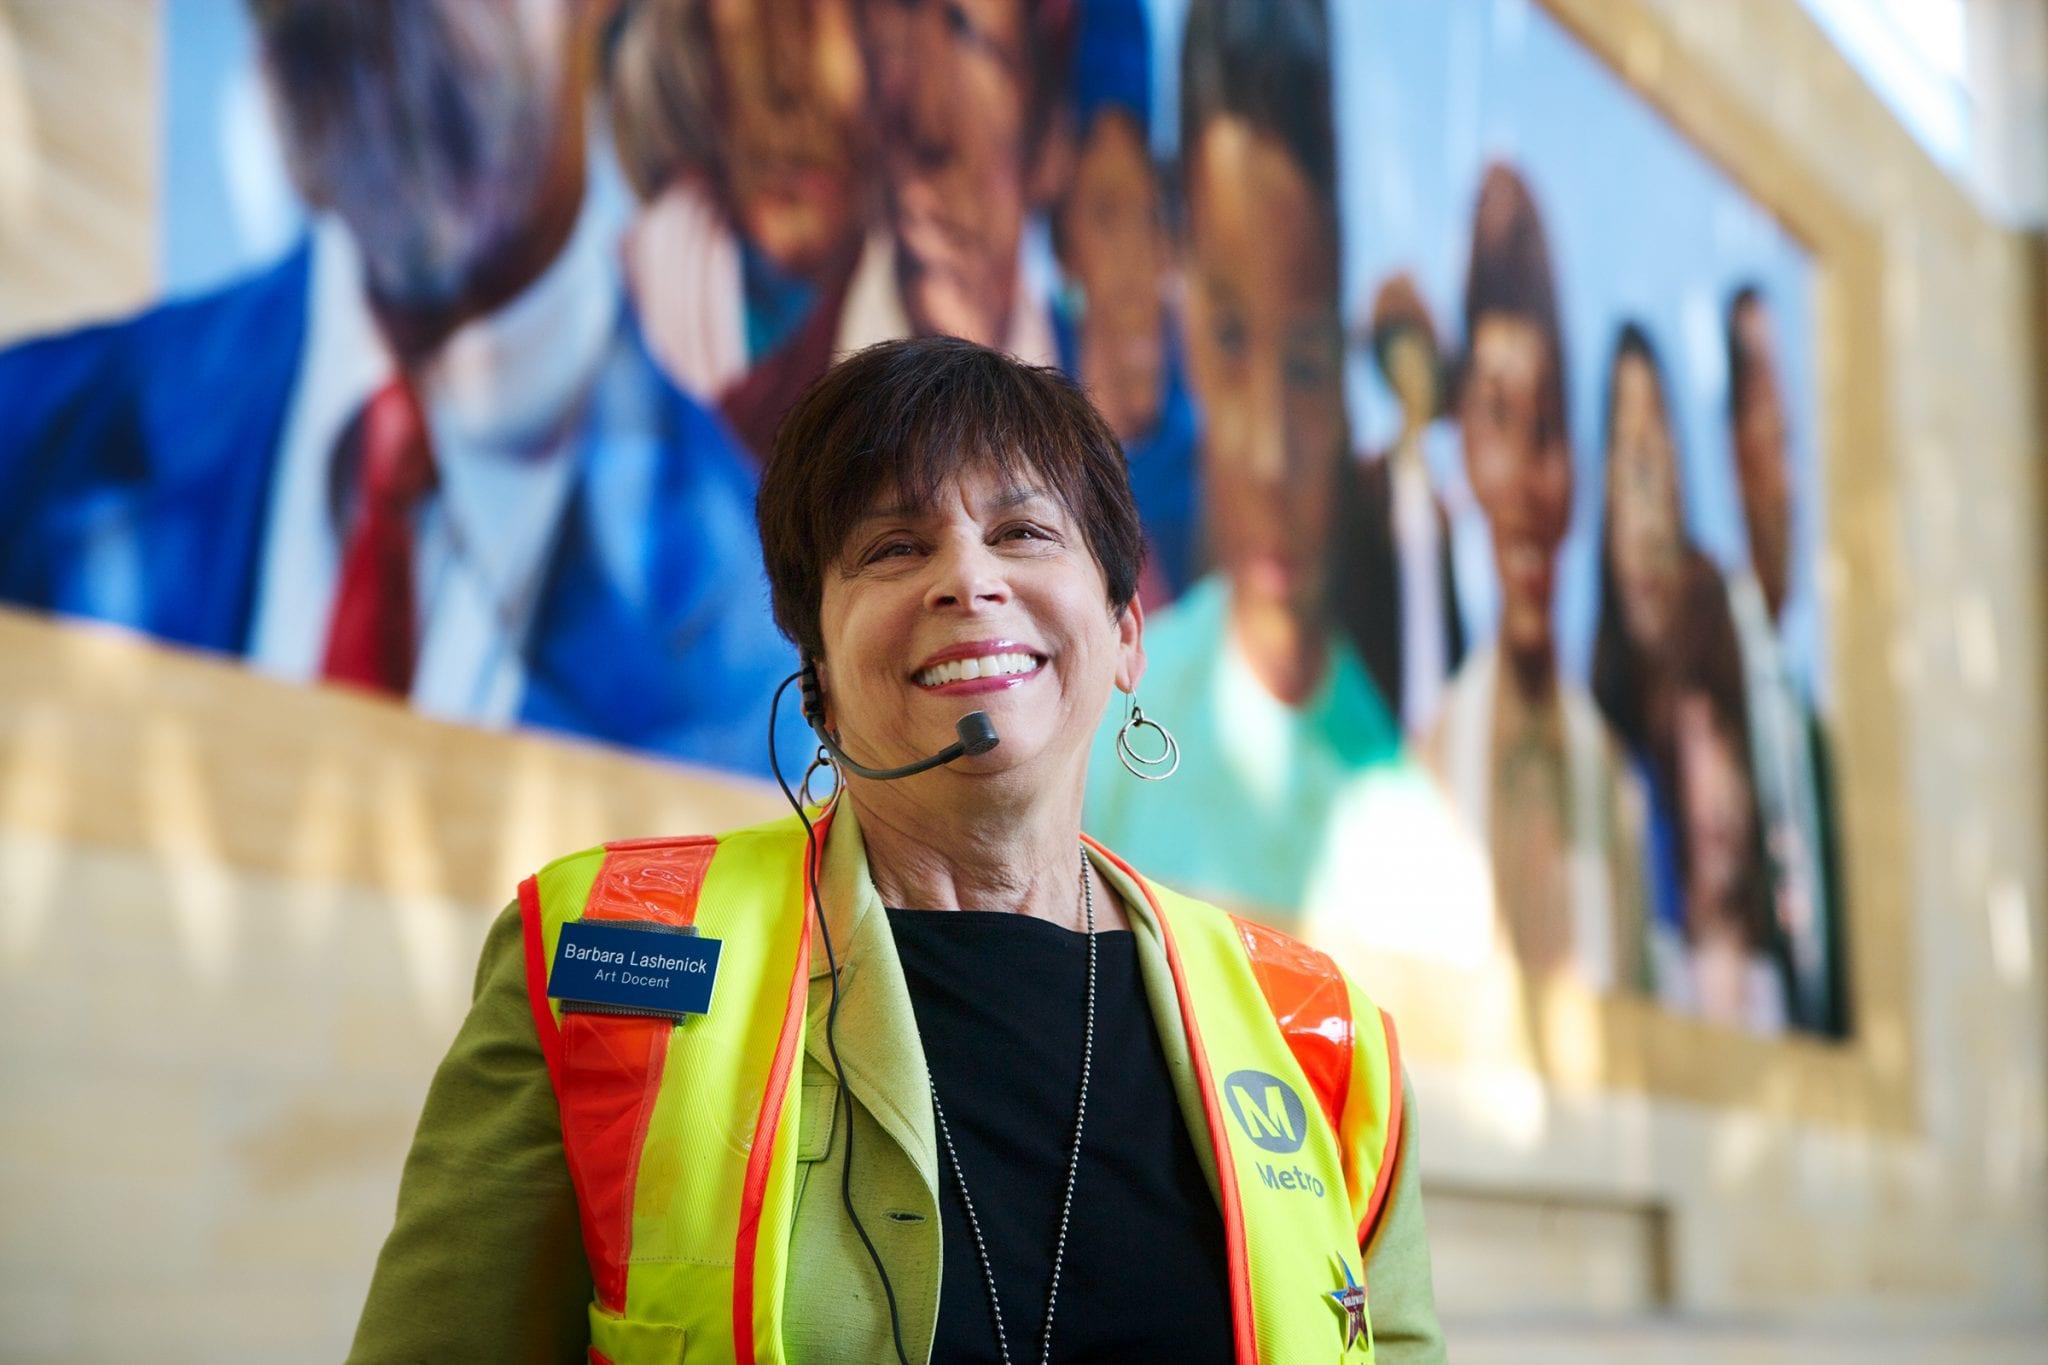 Metro Art Docent Council founder and coordinator Barbara Lashenick.